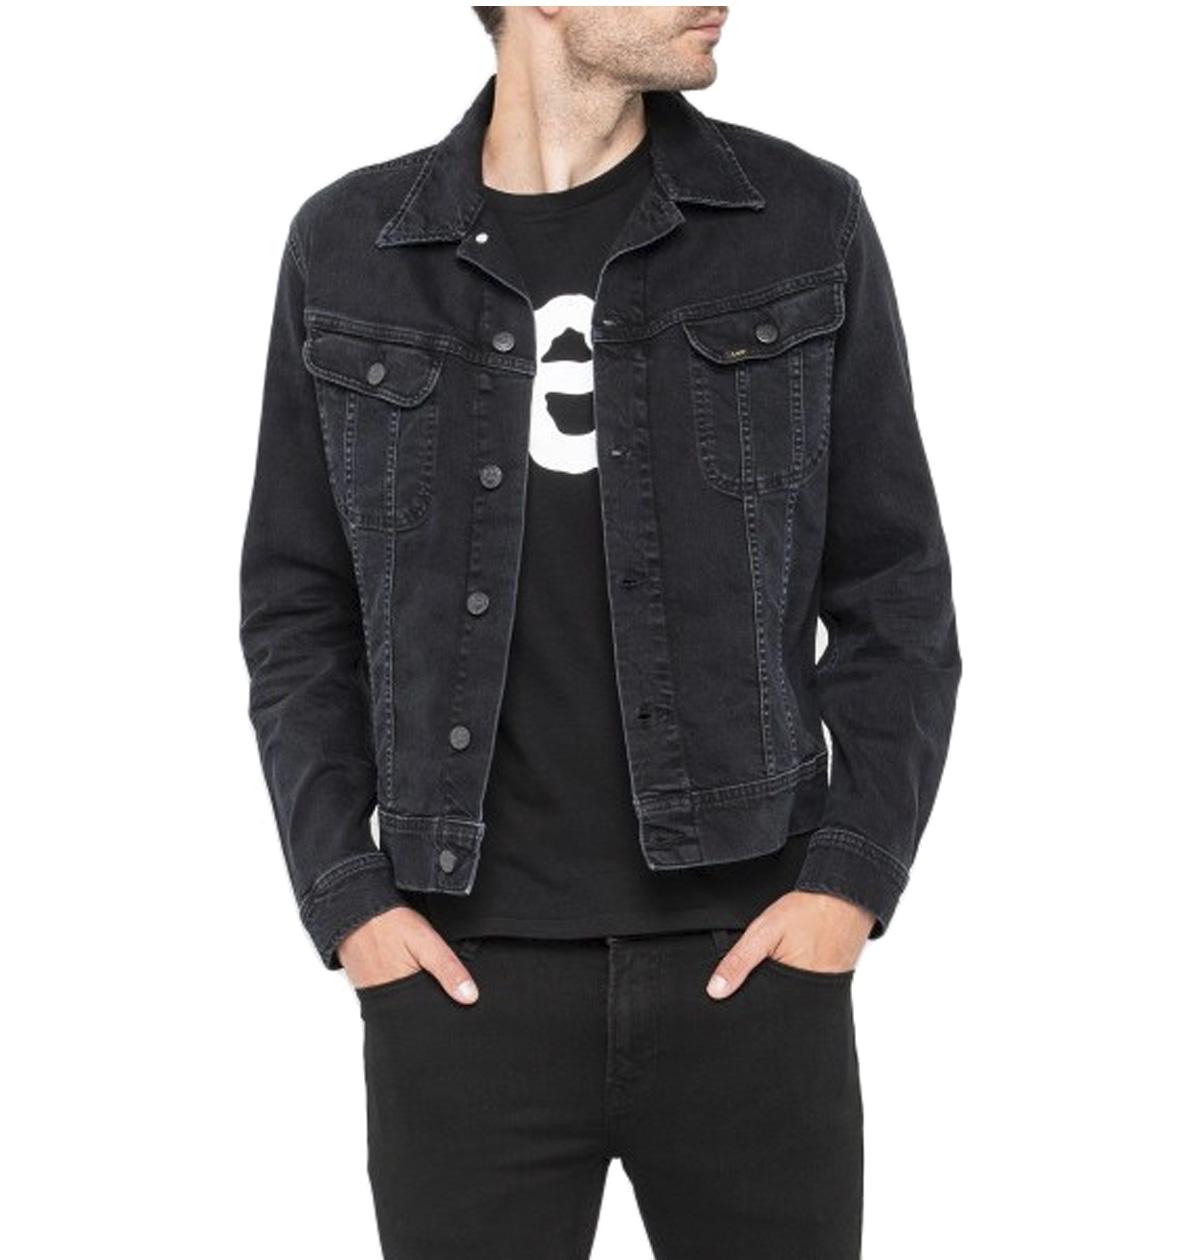 Lee Rider Jacket Chaqueta vaquera para Hombre